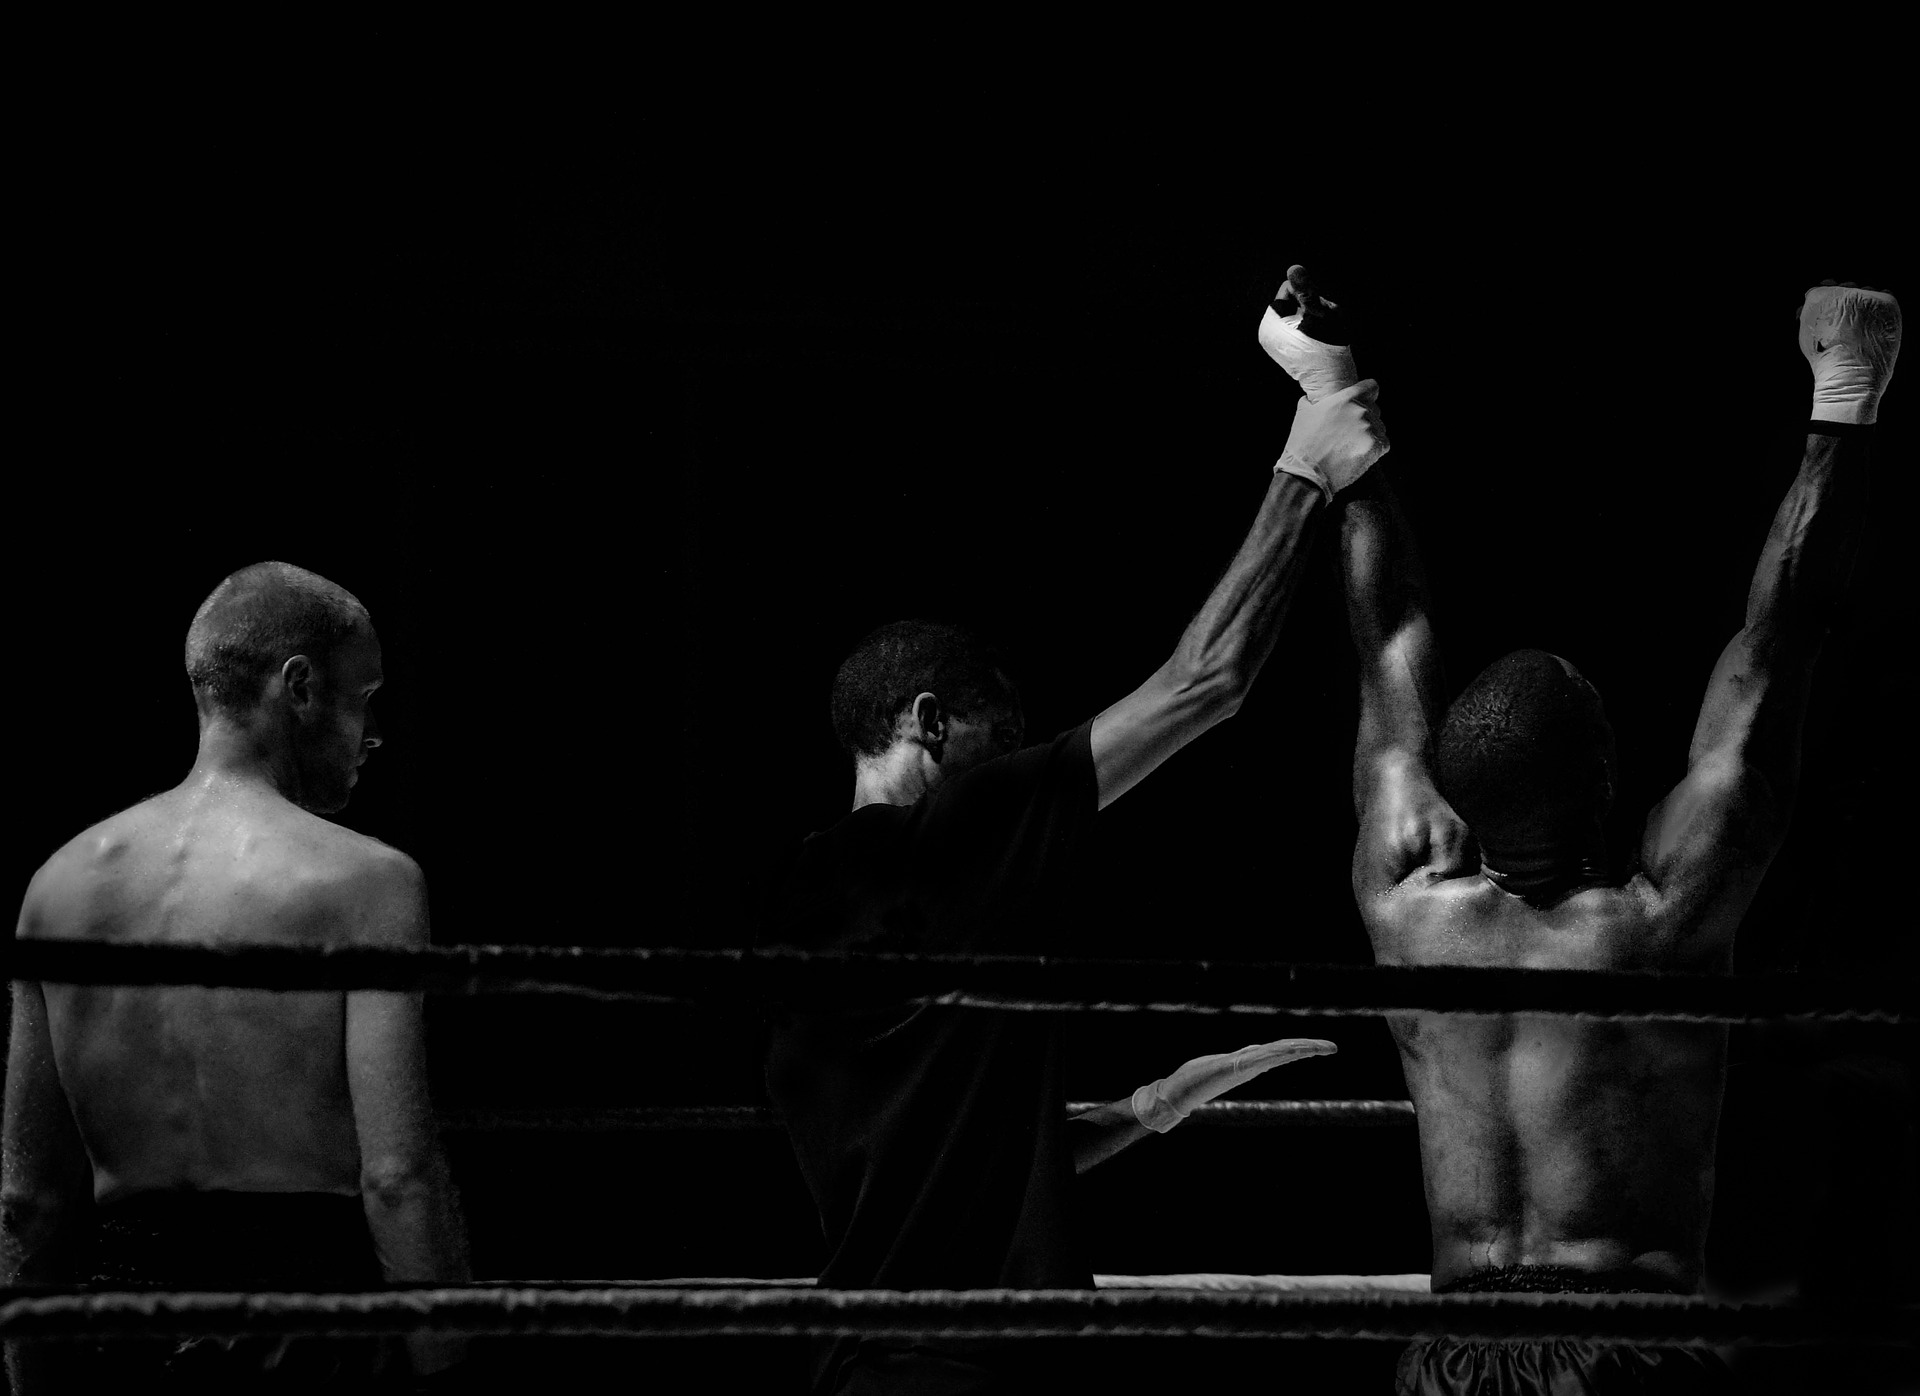 boxing-555735_1920.jpg